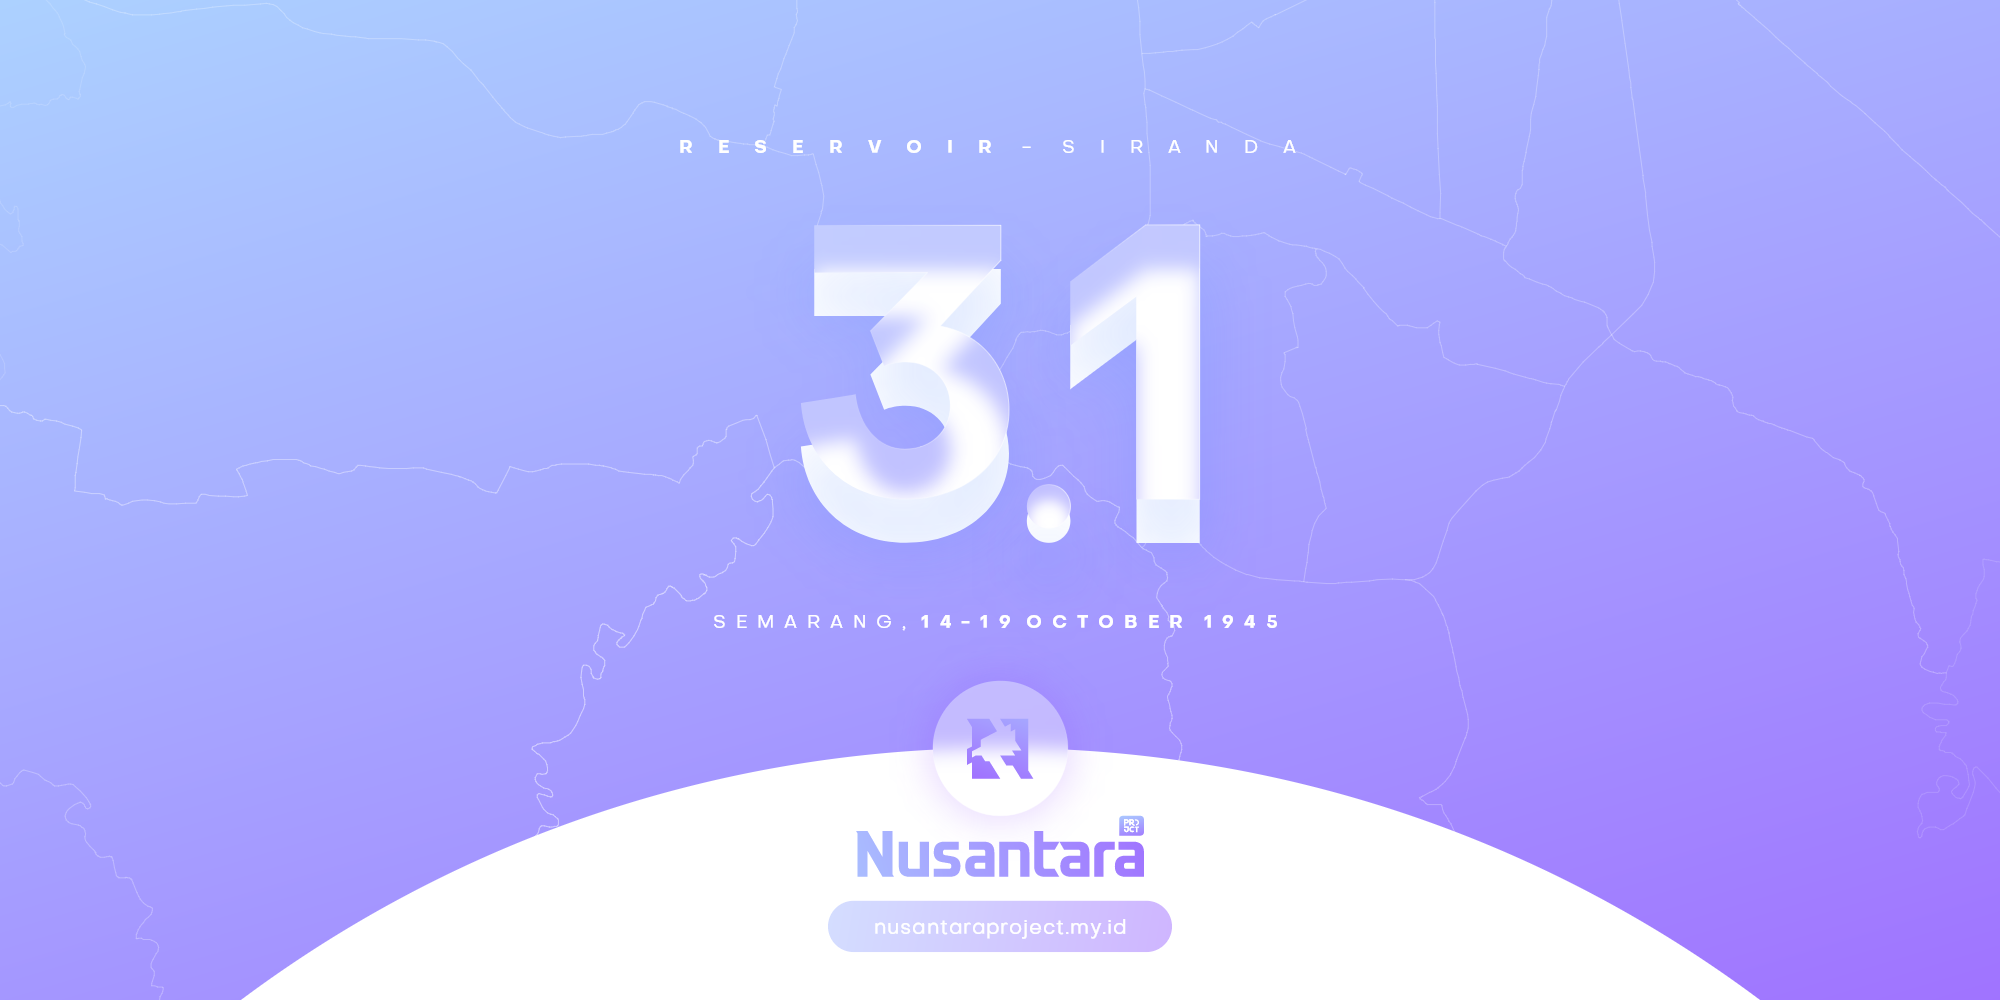 [ROM] NusantaraProject - v3.1 Reservoir [Mi 6][Sagit]